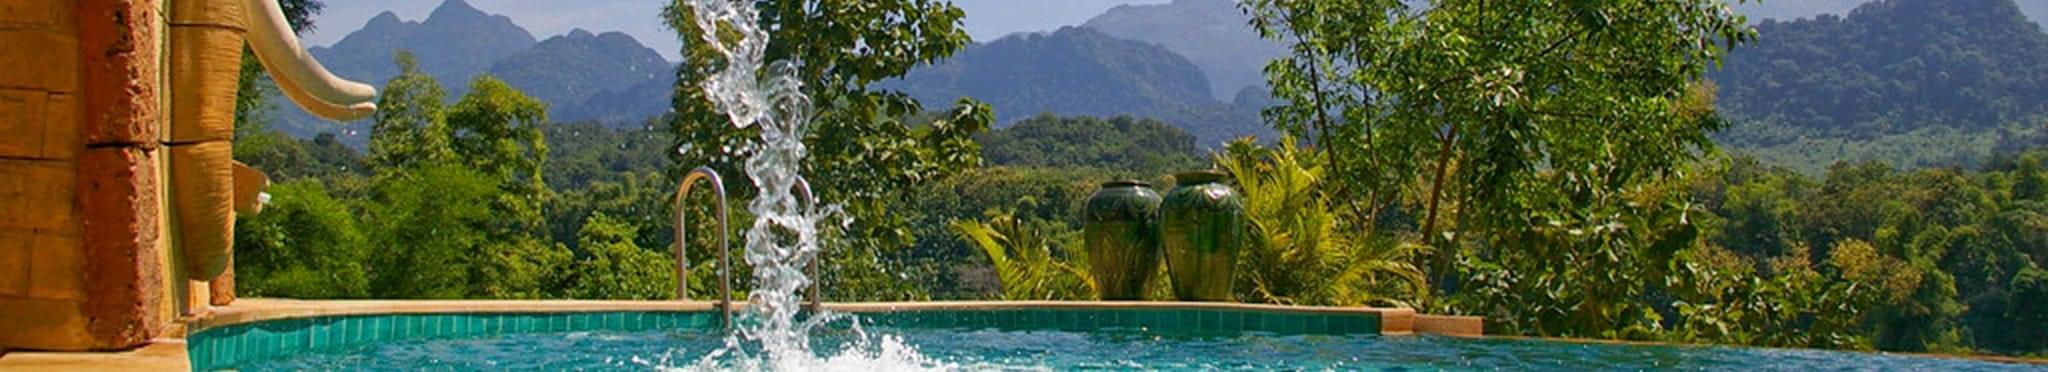 Красота Лаоса:<br>Хуайсай, Пакбенг, круиз по Меконгу, Луанг Прабанг